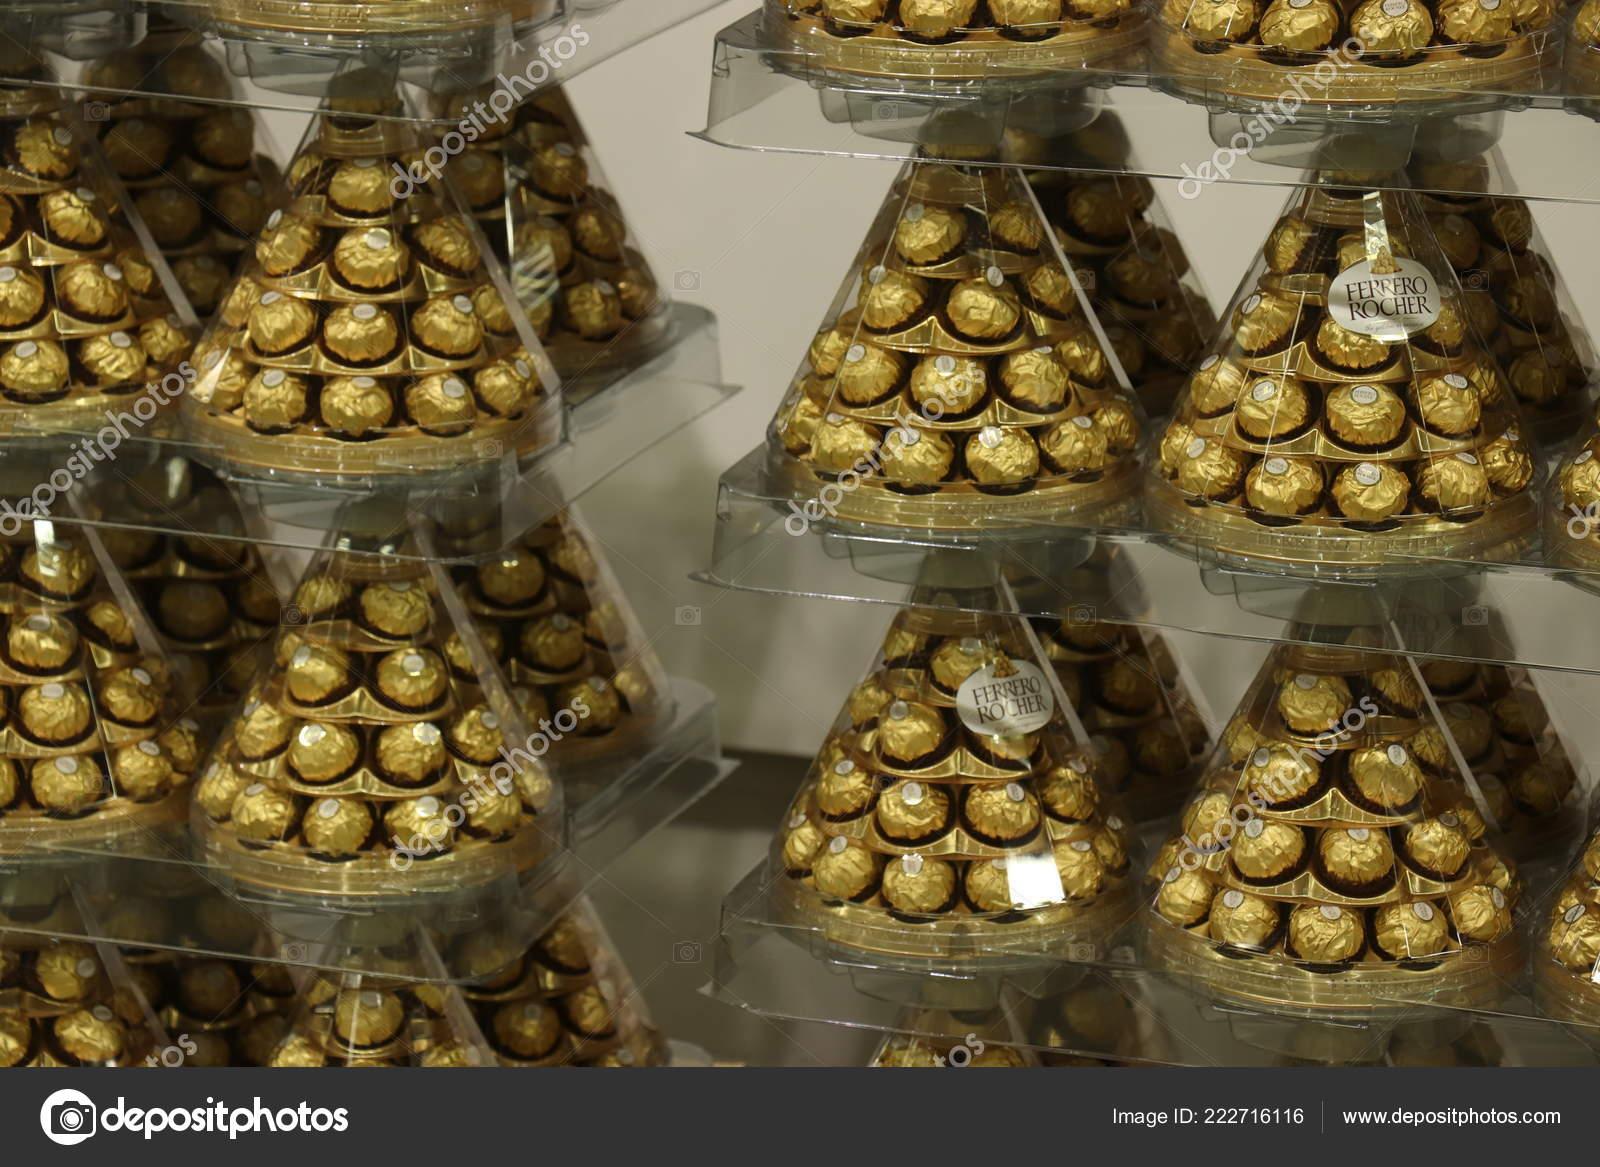 Ferrero Rocher Christmas Gifts